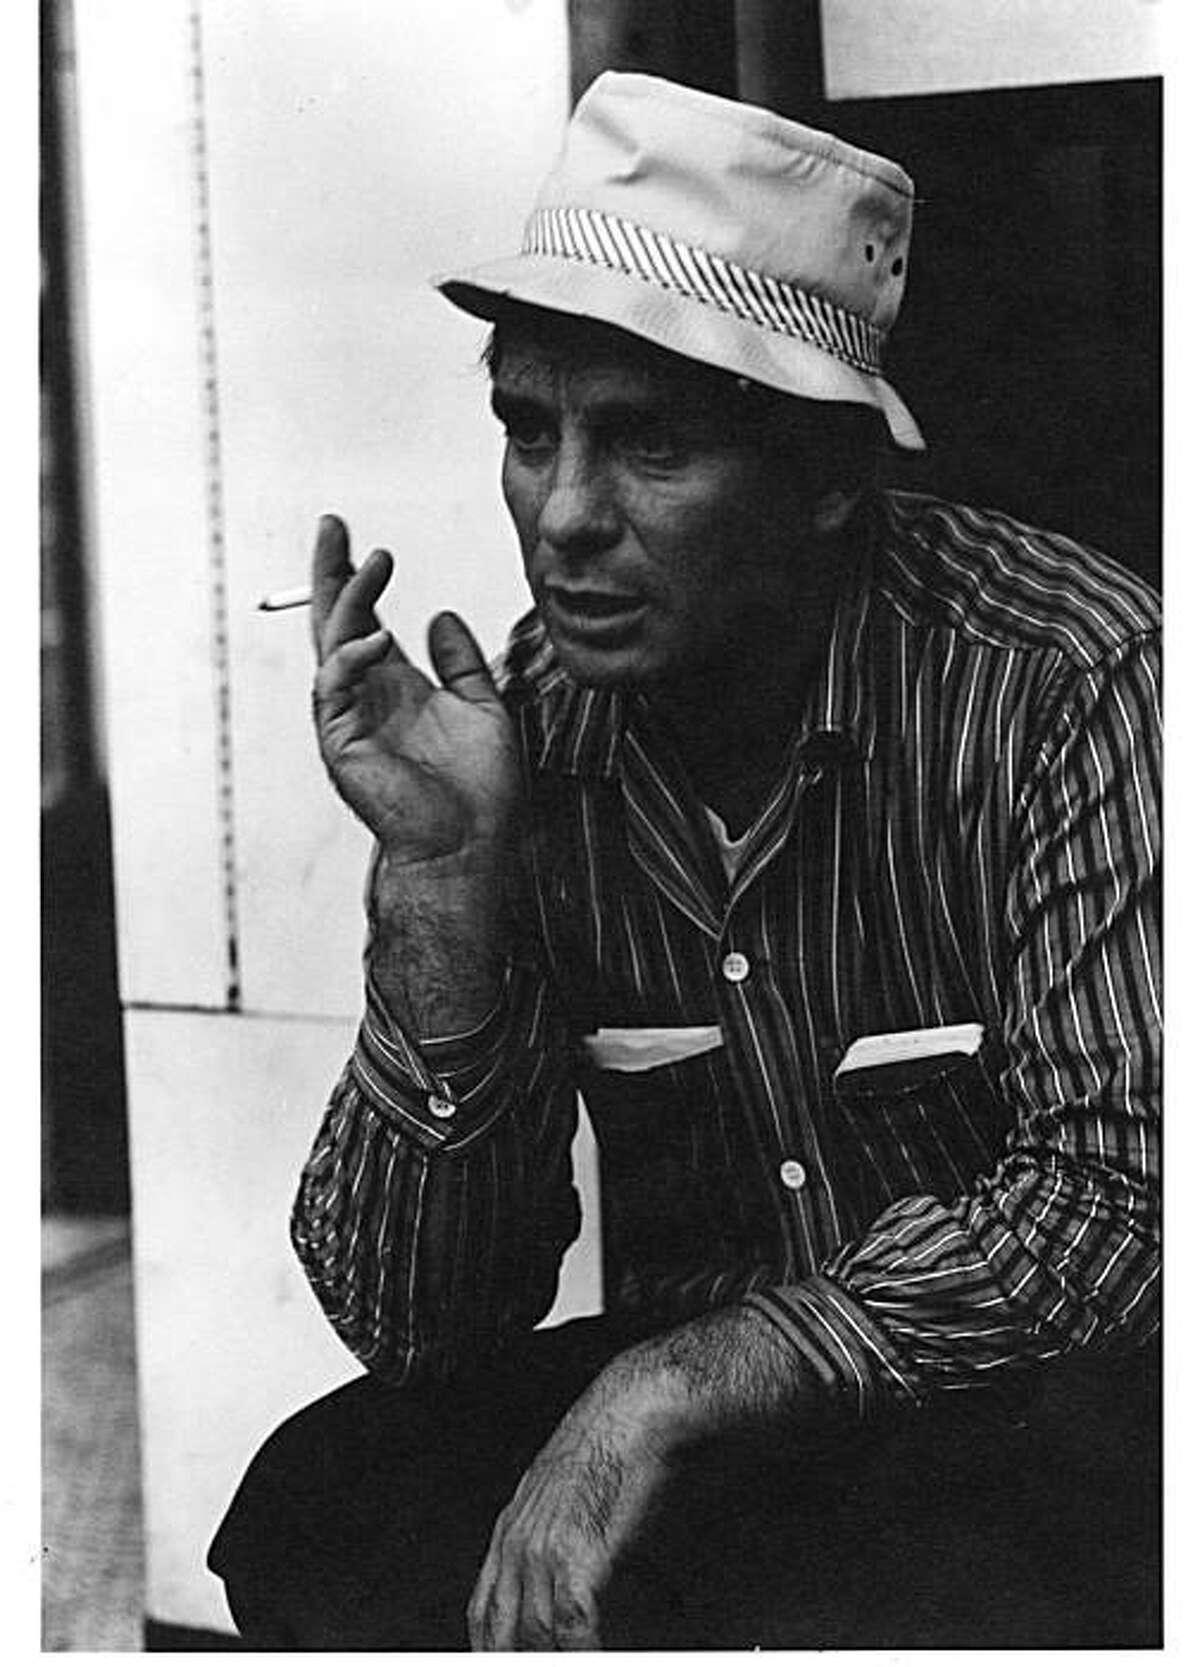 JACK KEROUAC IN NORTH BEACH IN 1960. ALSO RAN: 06/29/2000 Ran on: 08-15-2009 Writer-adventurer Jack Kerouac, above, hangs out in North Beach in 1960; inset left, his daughter, Jan Kerouac, and nephew Paul Blake Jr. in Corte Madera in 1995.